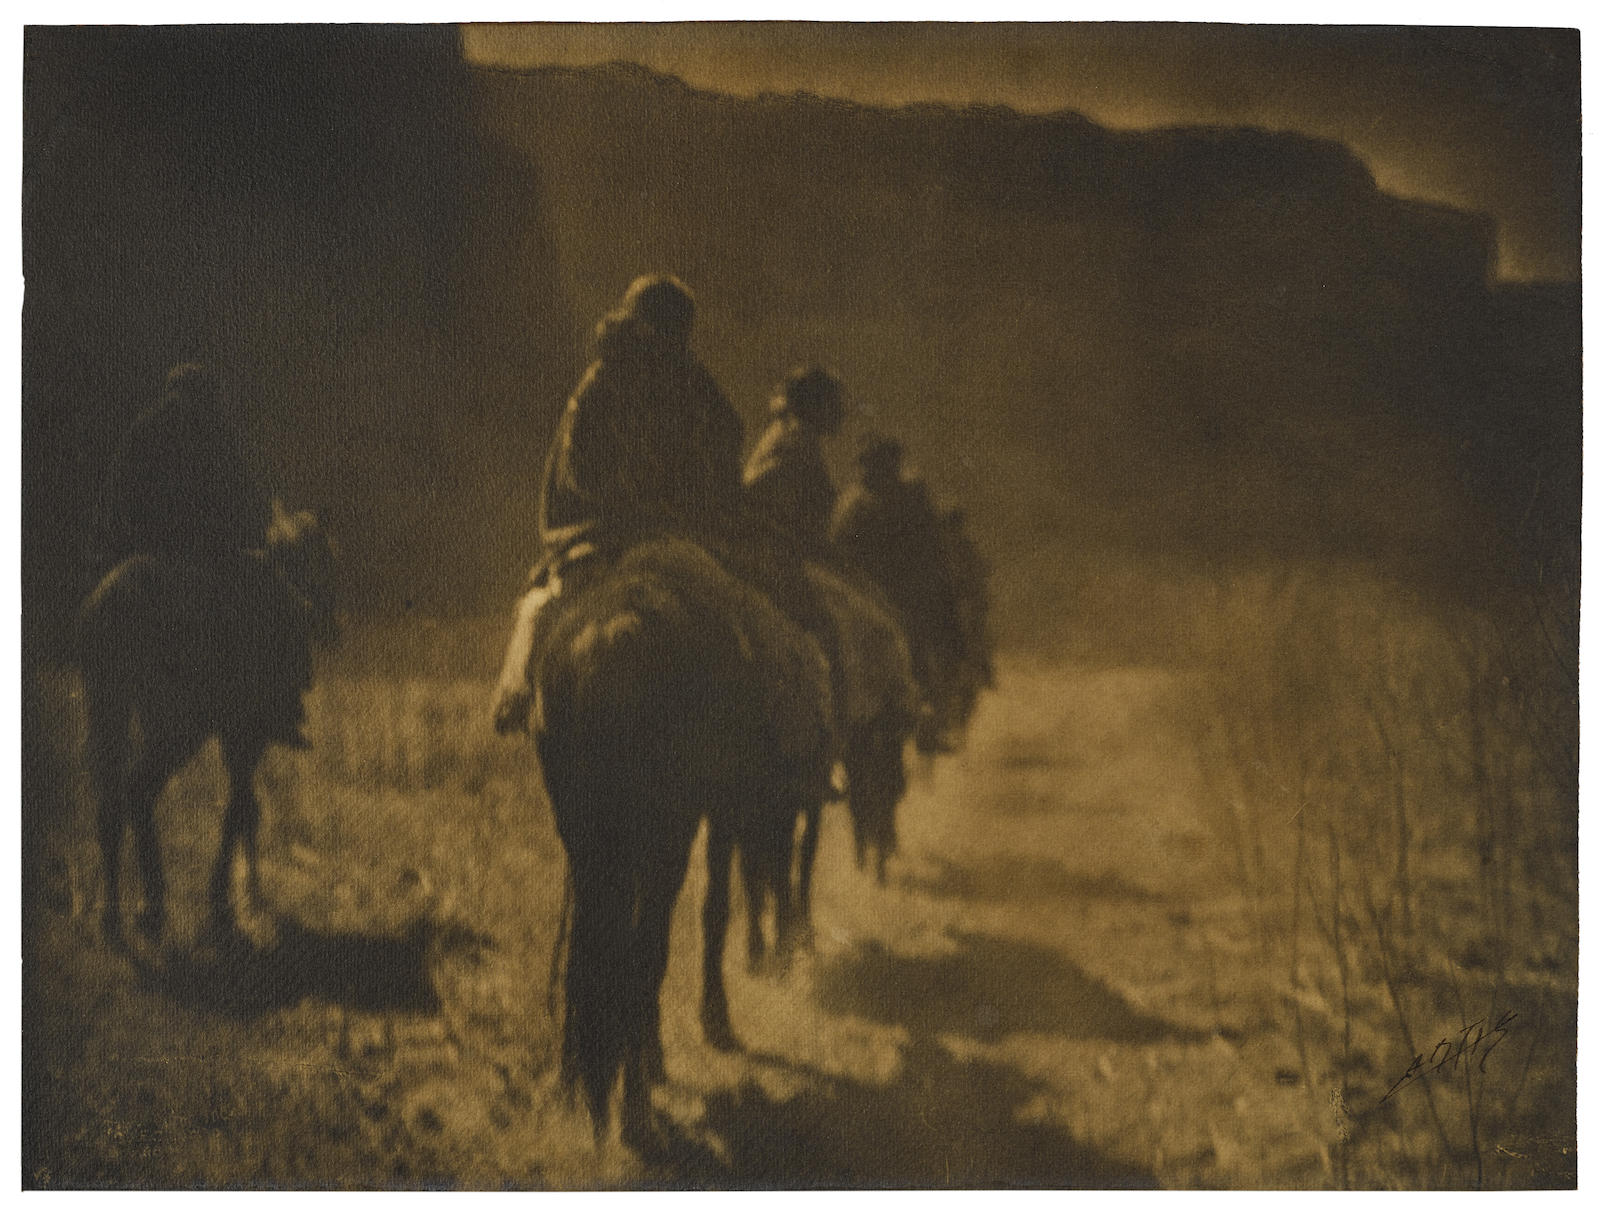 Edward S. Curtis-The Vanishing Race-1904